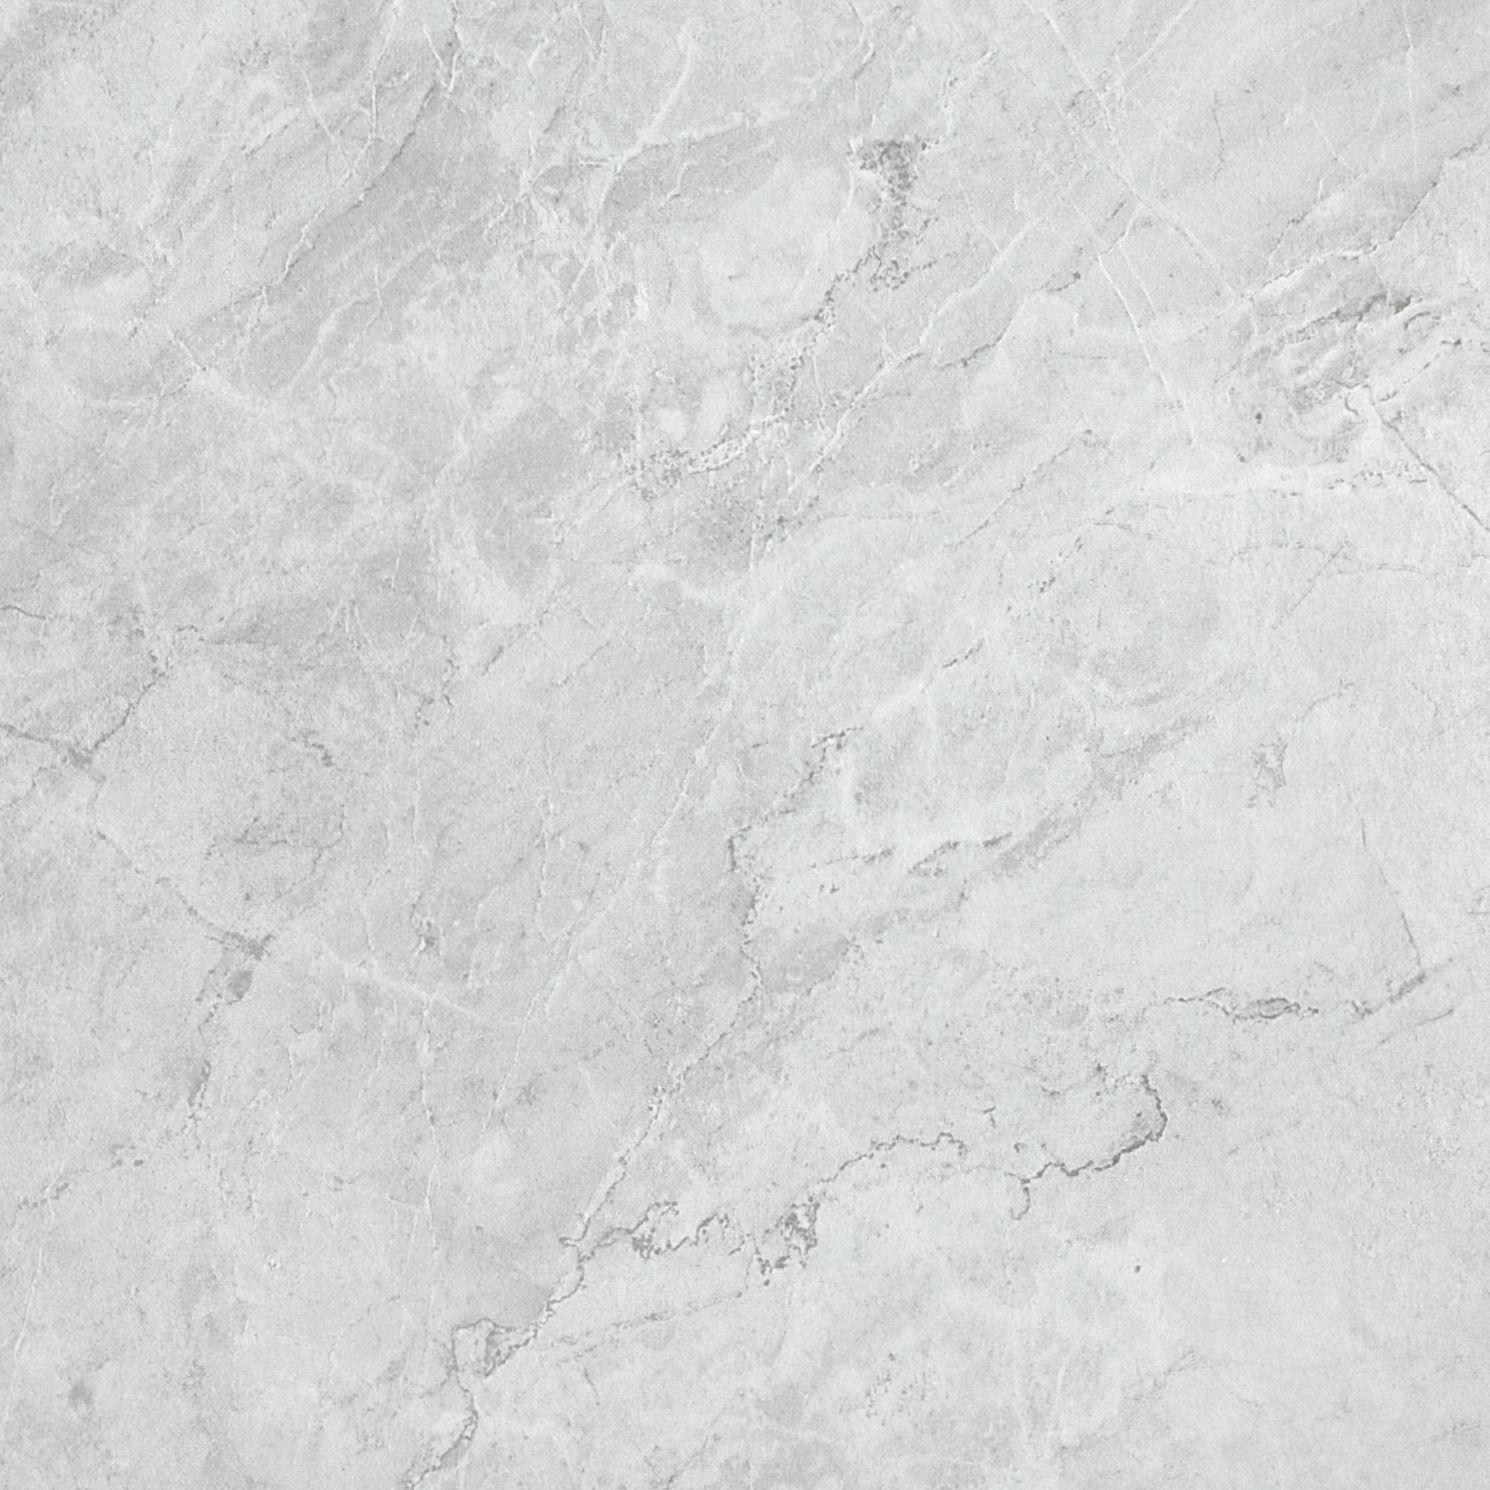 Malena ice 13x13 tile ceramic profiletile decorating malena ice 13x13 tile ceramic profiletile dailygadgetfo Gallery